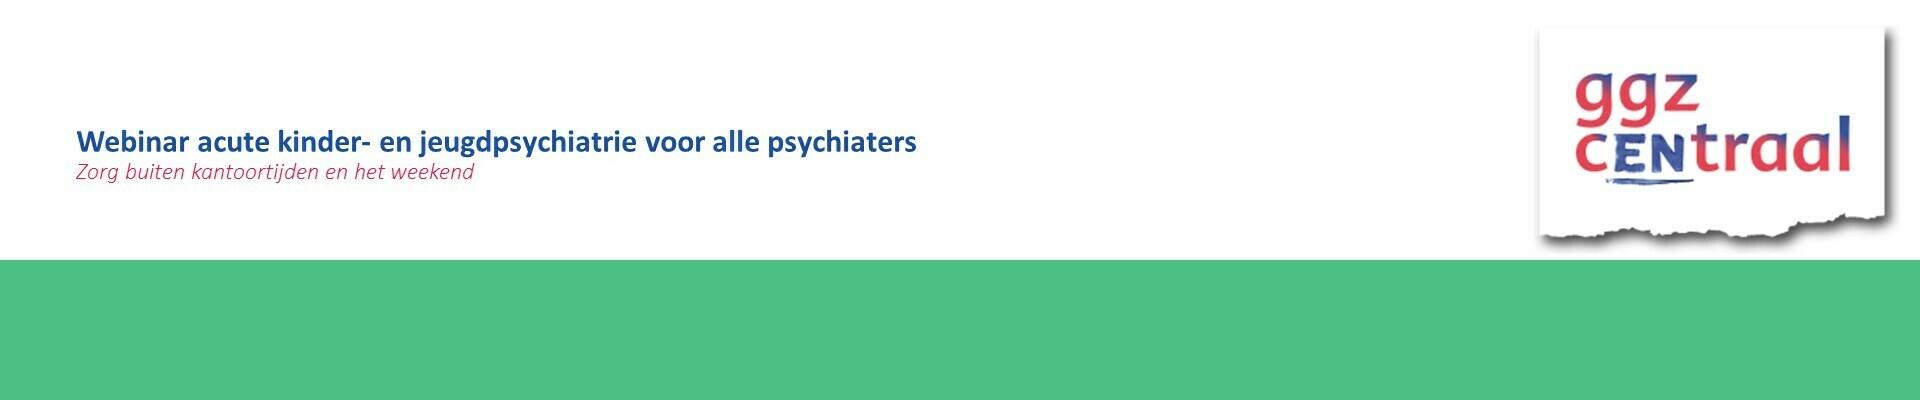 Webinar acute kinder- en jeugdpsychiatrie